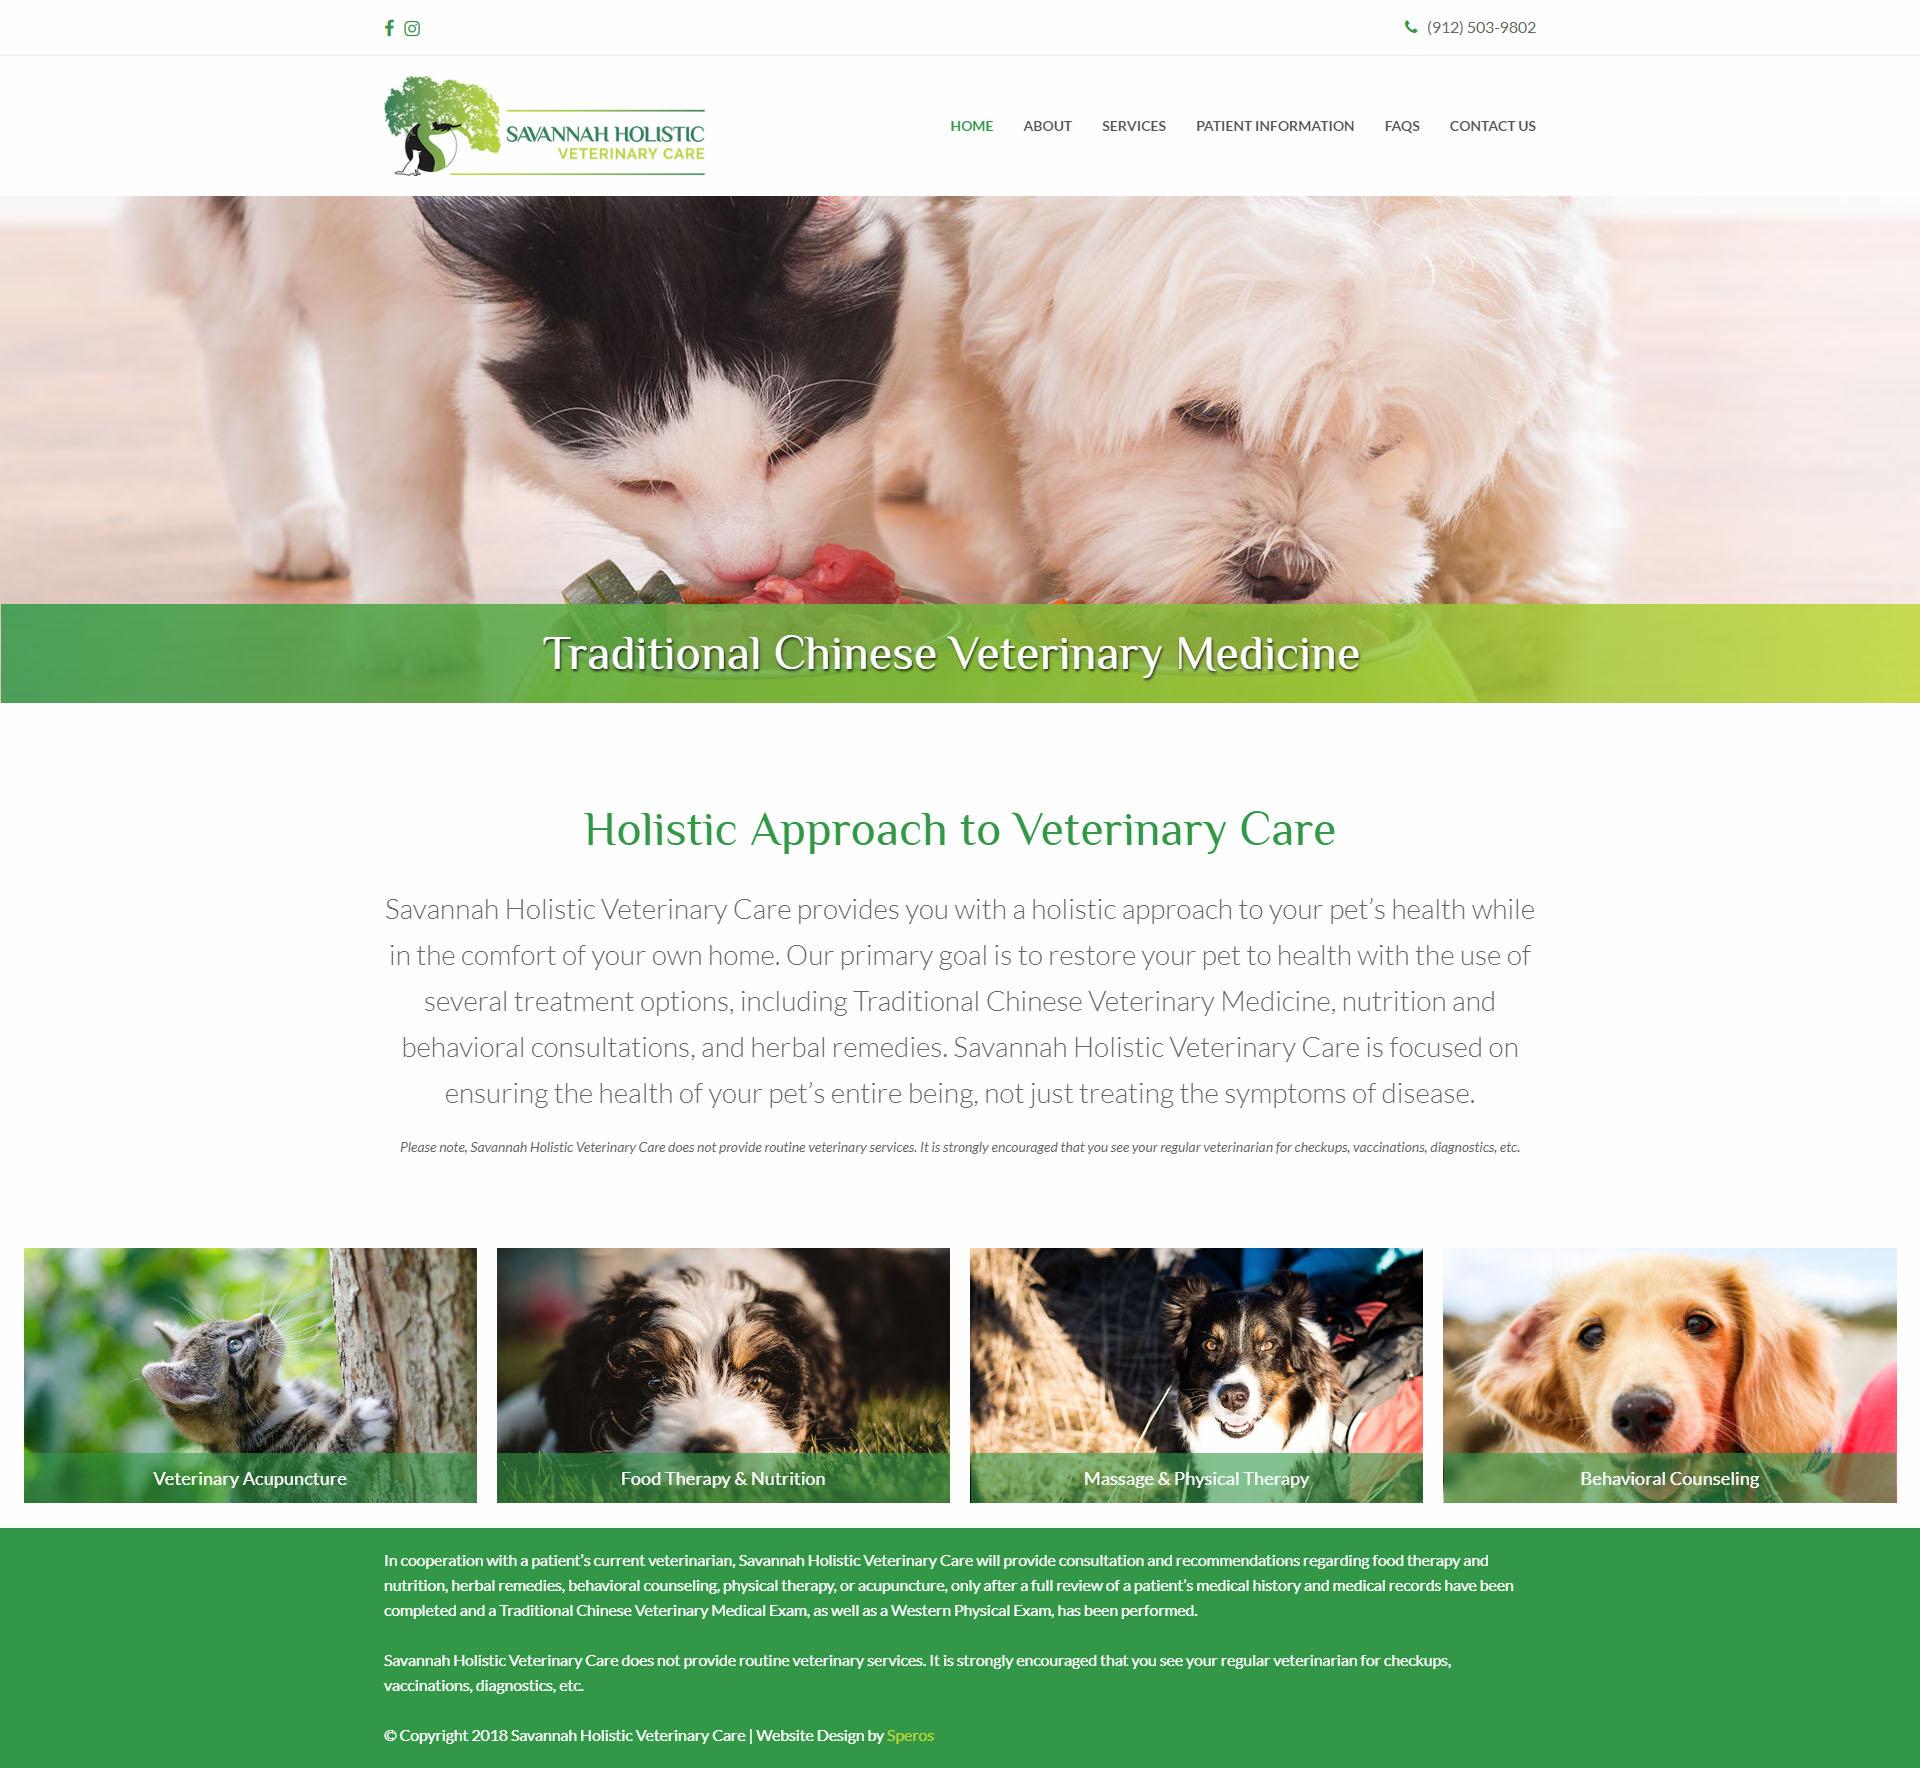 Savannah Holistic Veterinary Care Home Page - Website Design - Speros